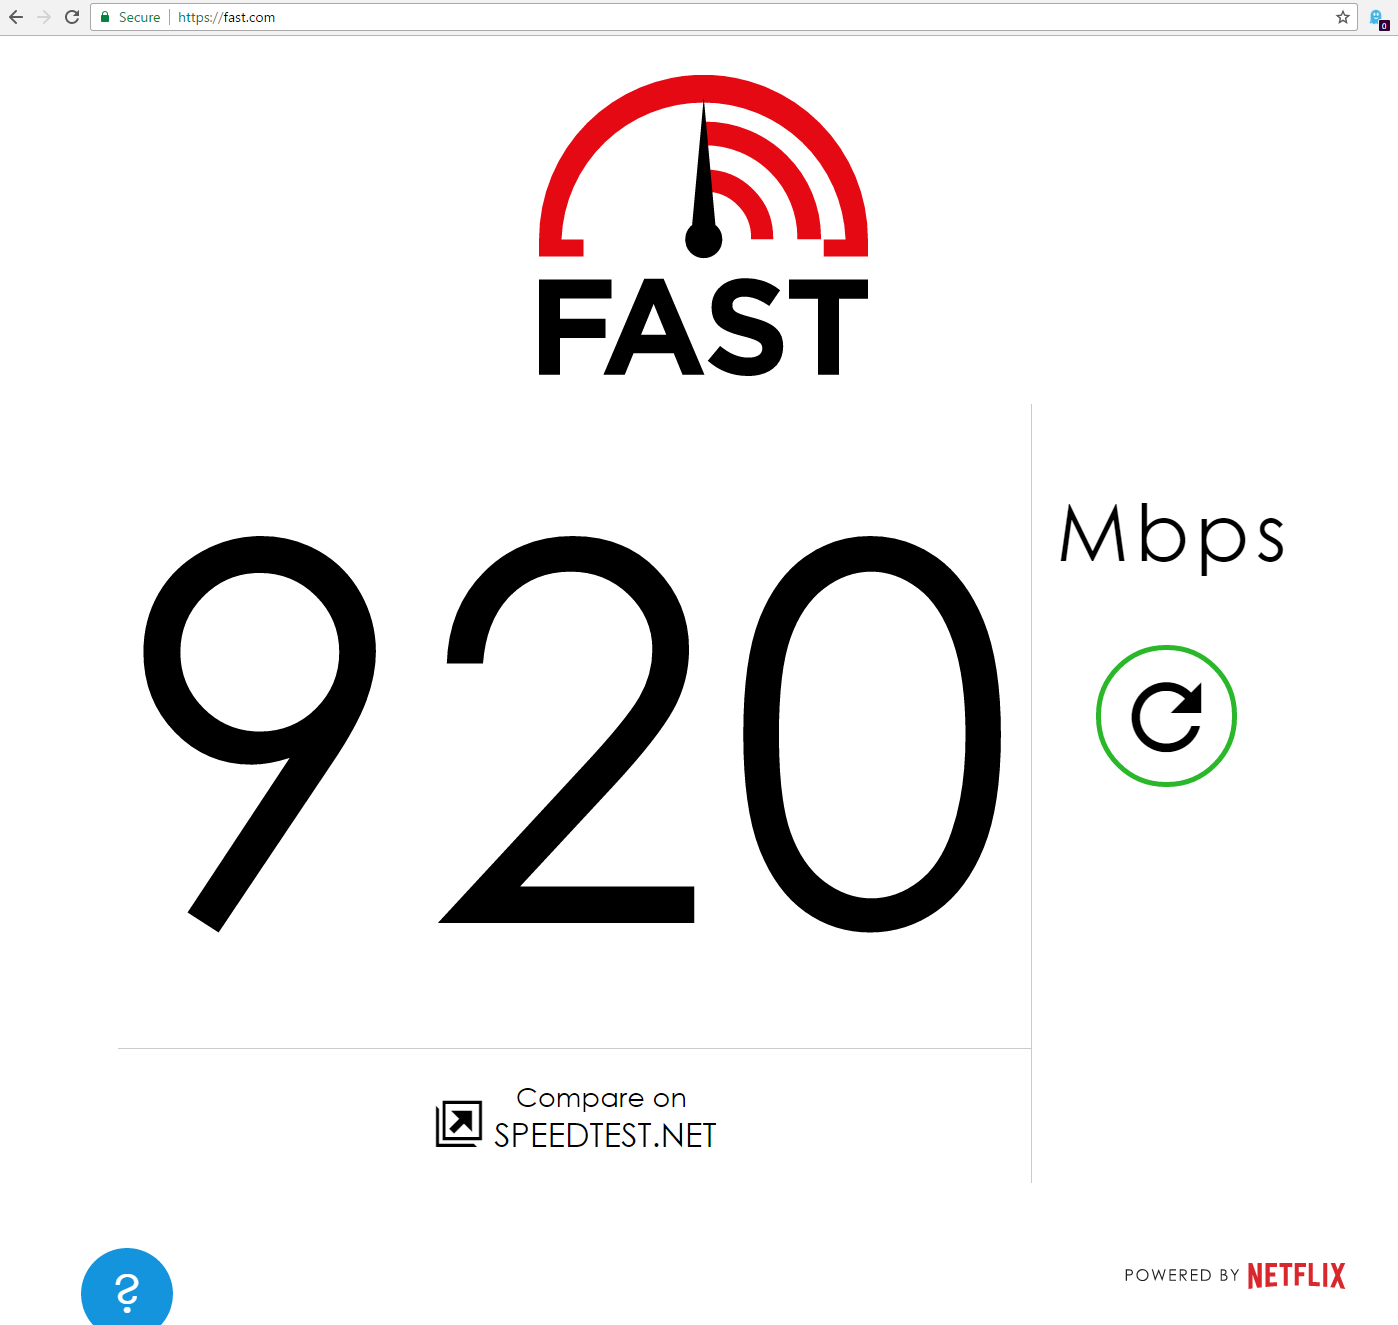 My home network: Ubiquiti UniFi gear, fiber gigabit Internet